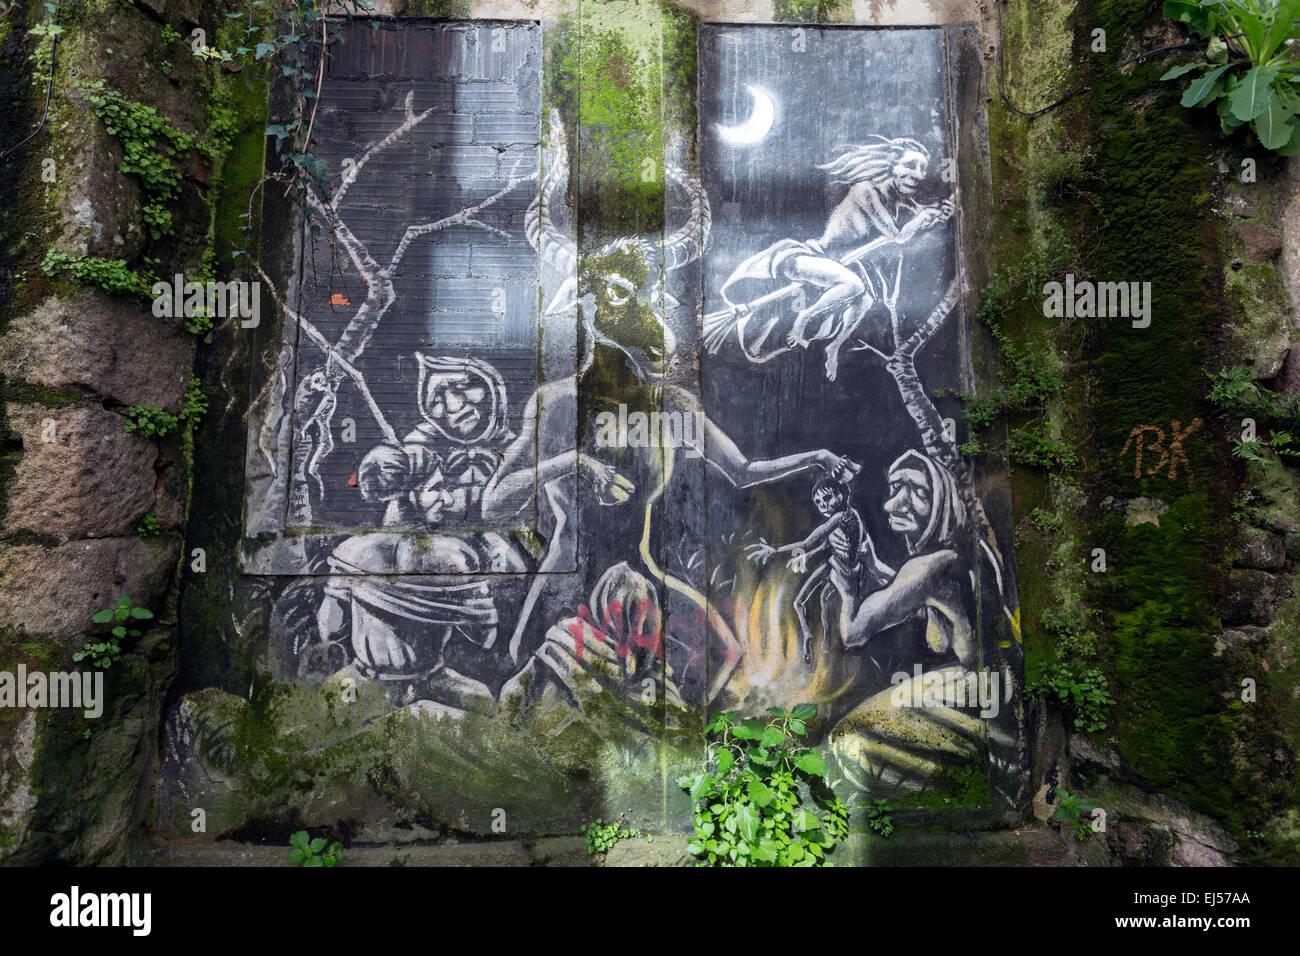 witchcraft-graffiti-in-pontevedra-EJ57AA